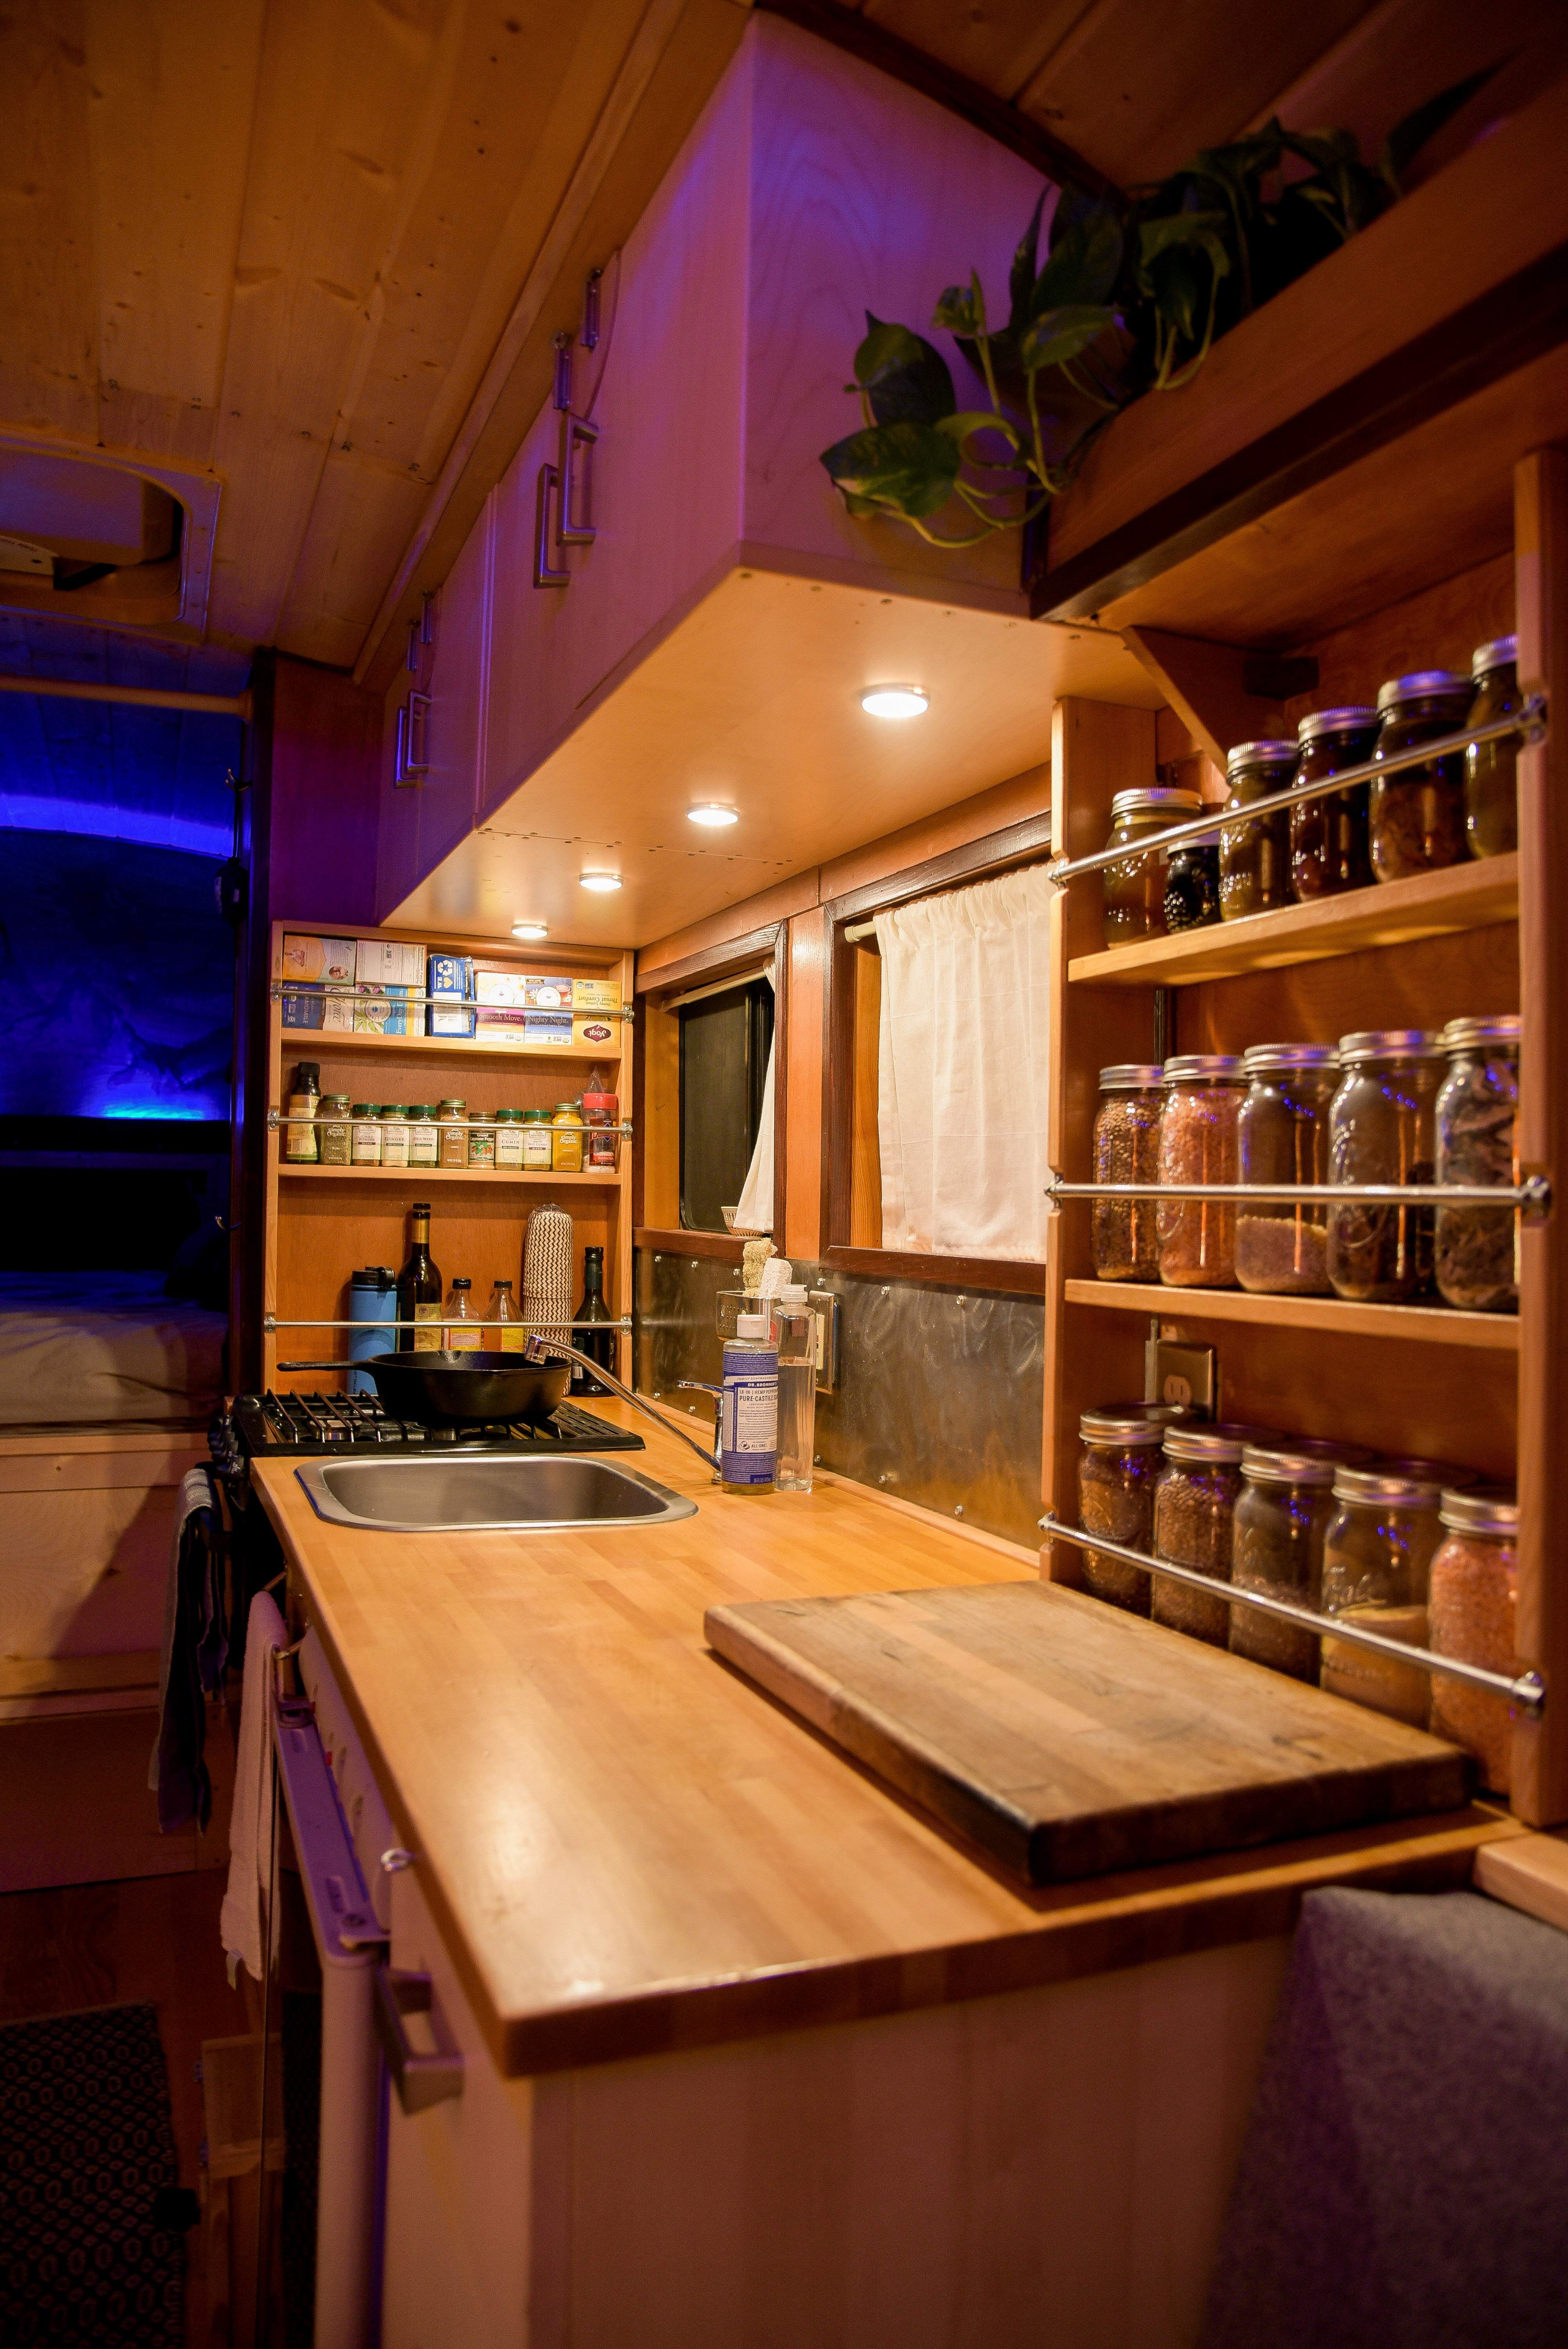 School Bus Tiny House Conversion Kitchen, Skoolie, Buslife